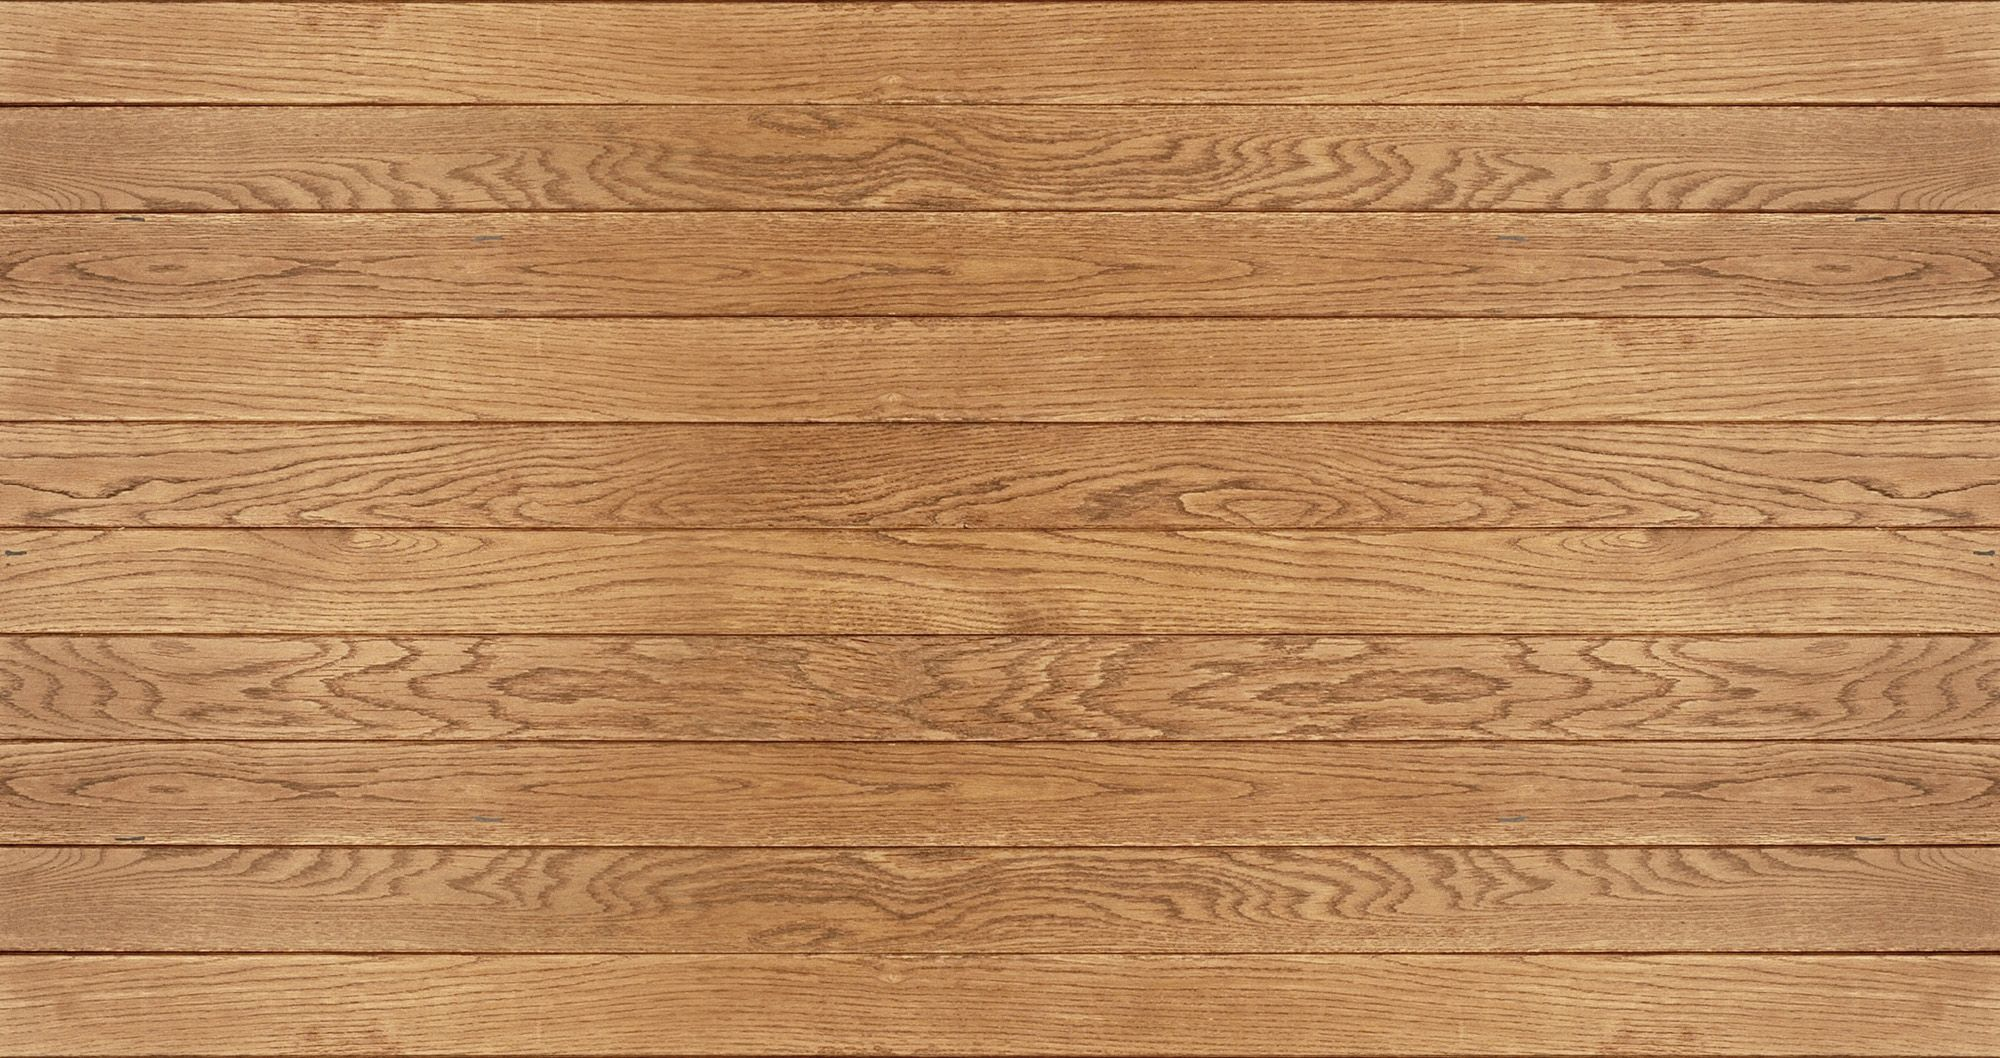 Light Wood Plank Textureallaboutbeauty21 | Textures ...